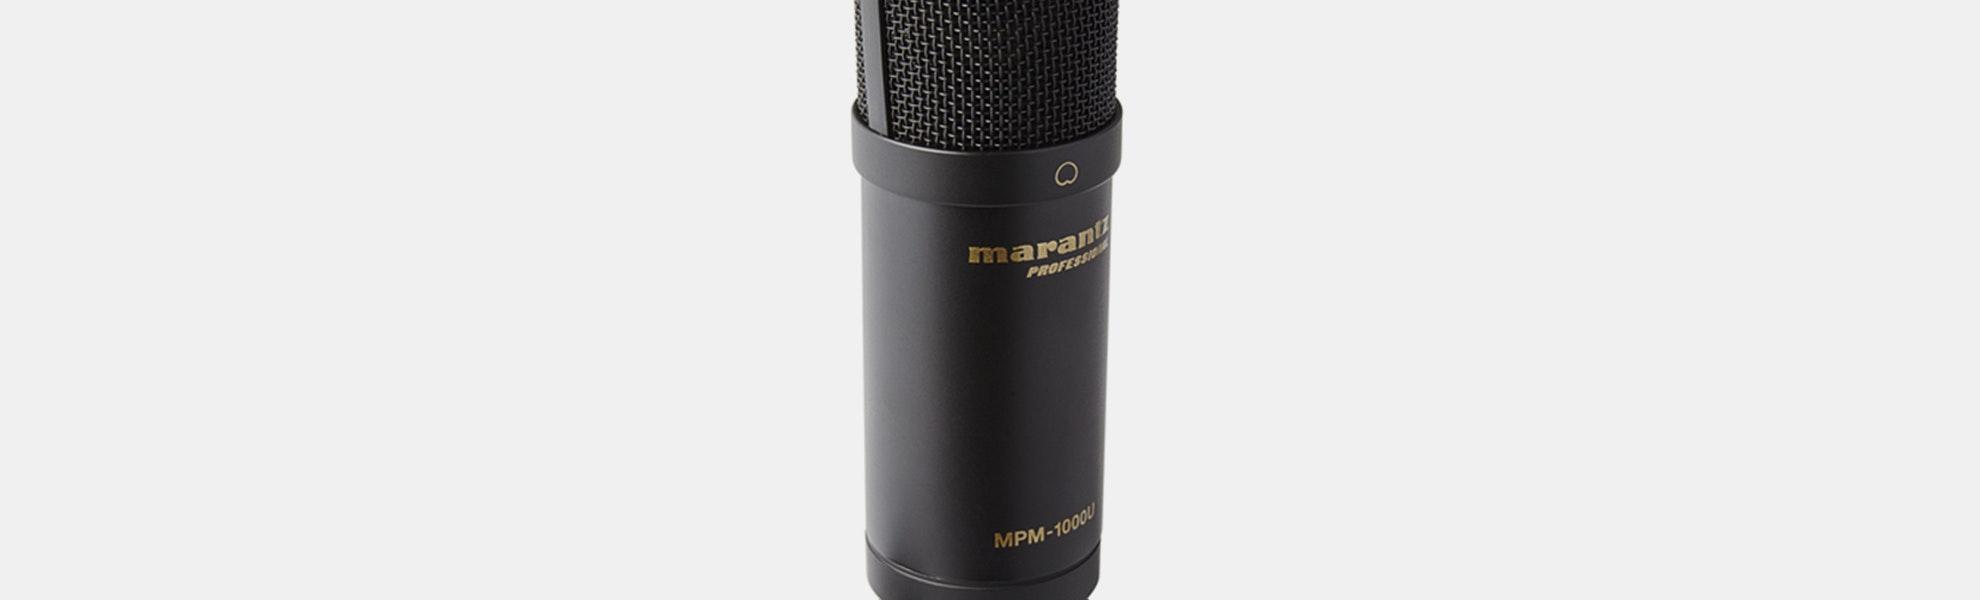 Marantz MPM-1000U & MPM-2000U Microphones